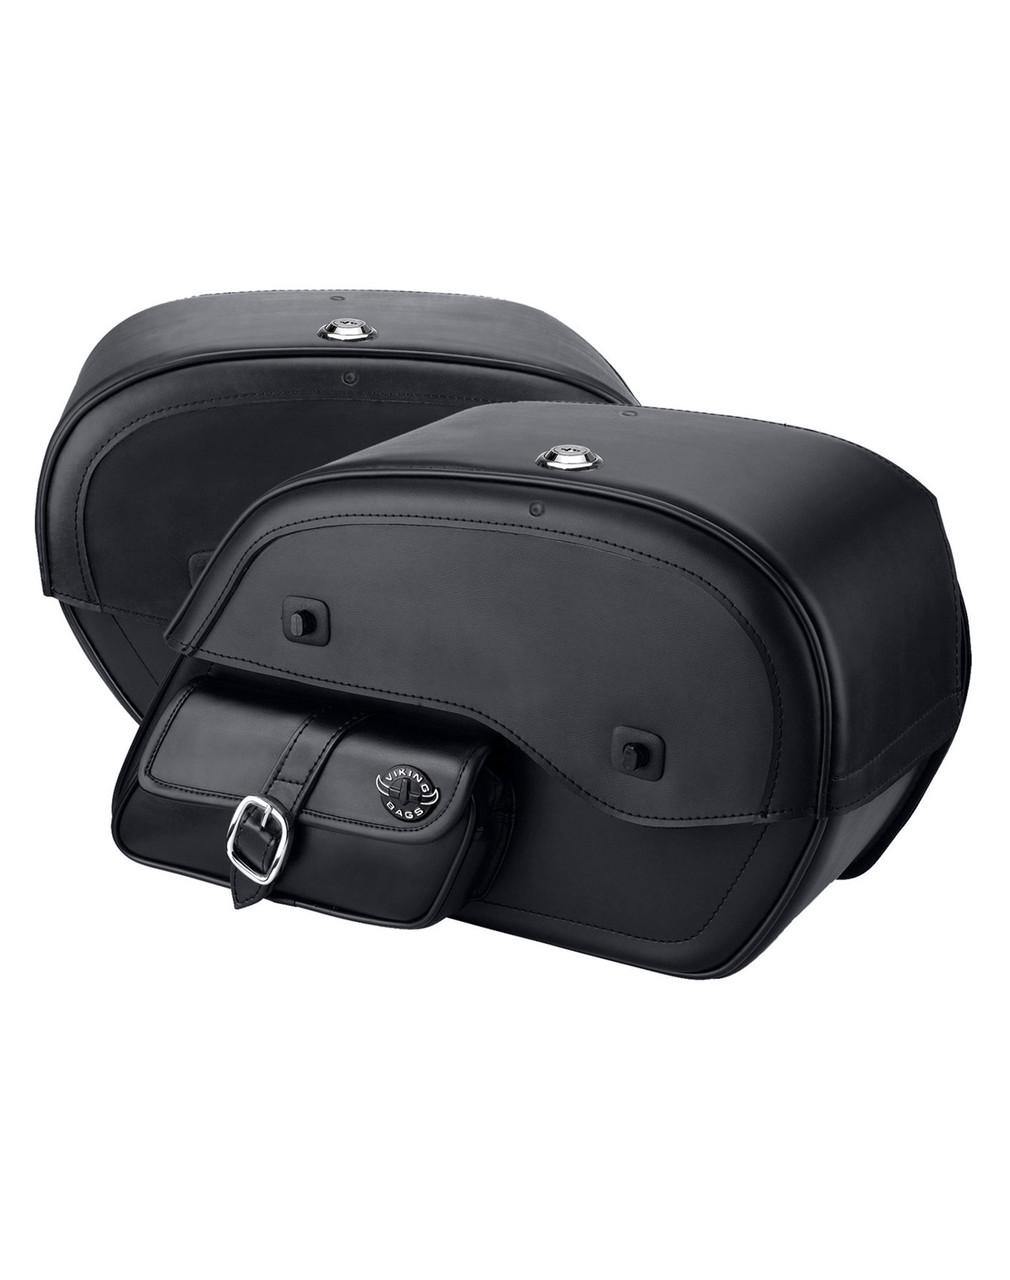 Honda 1500 Valkyrie Interstate Side Pocket Motorcycle Saddlebags Both Bags View